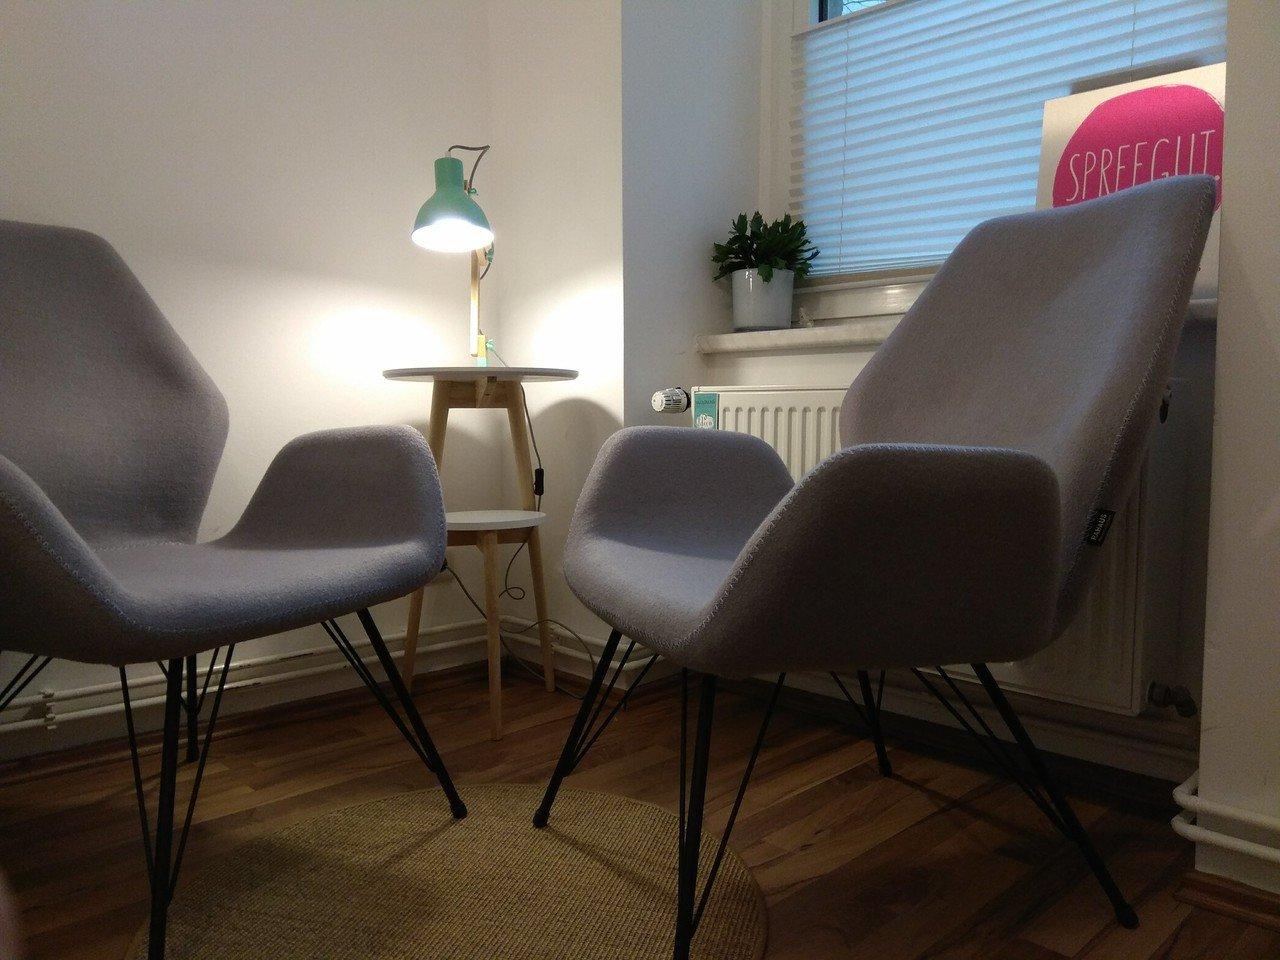 spreegut mieten in berlin. Black Bedroom Furniture Sets. Home Design Ideas